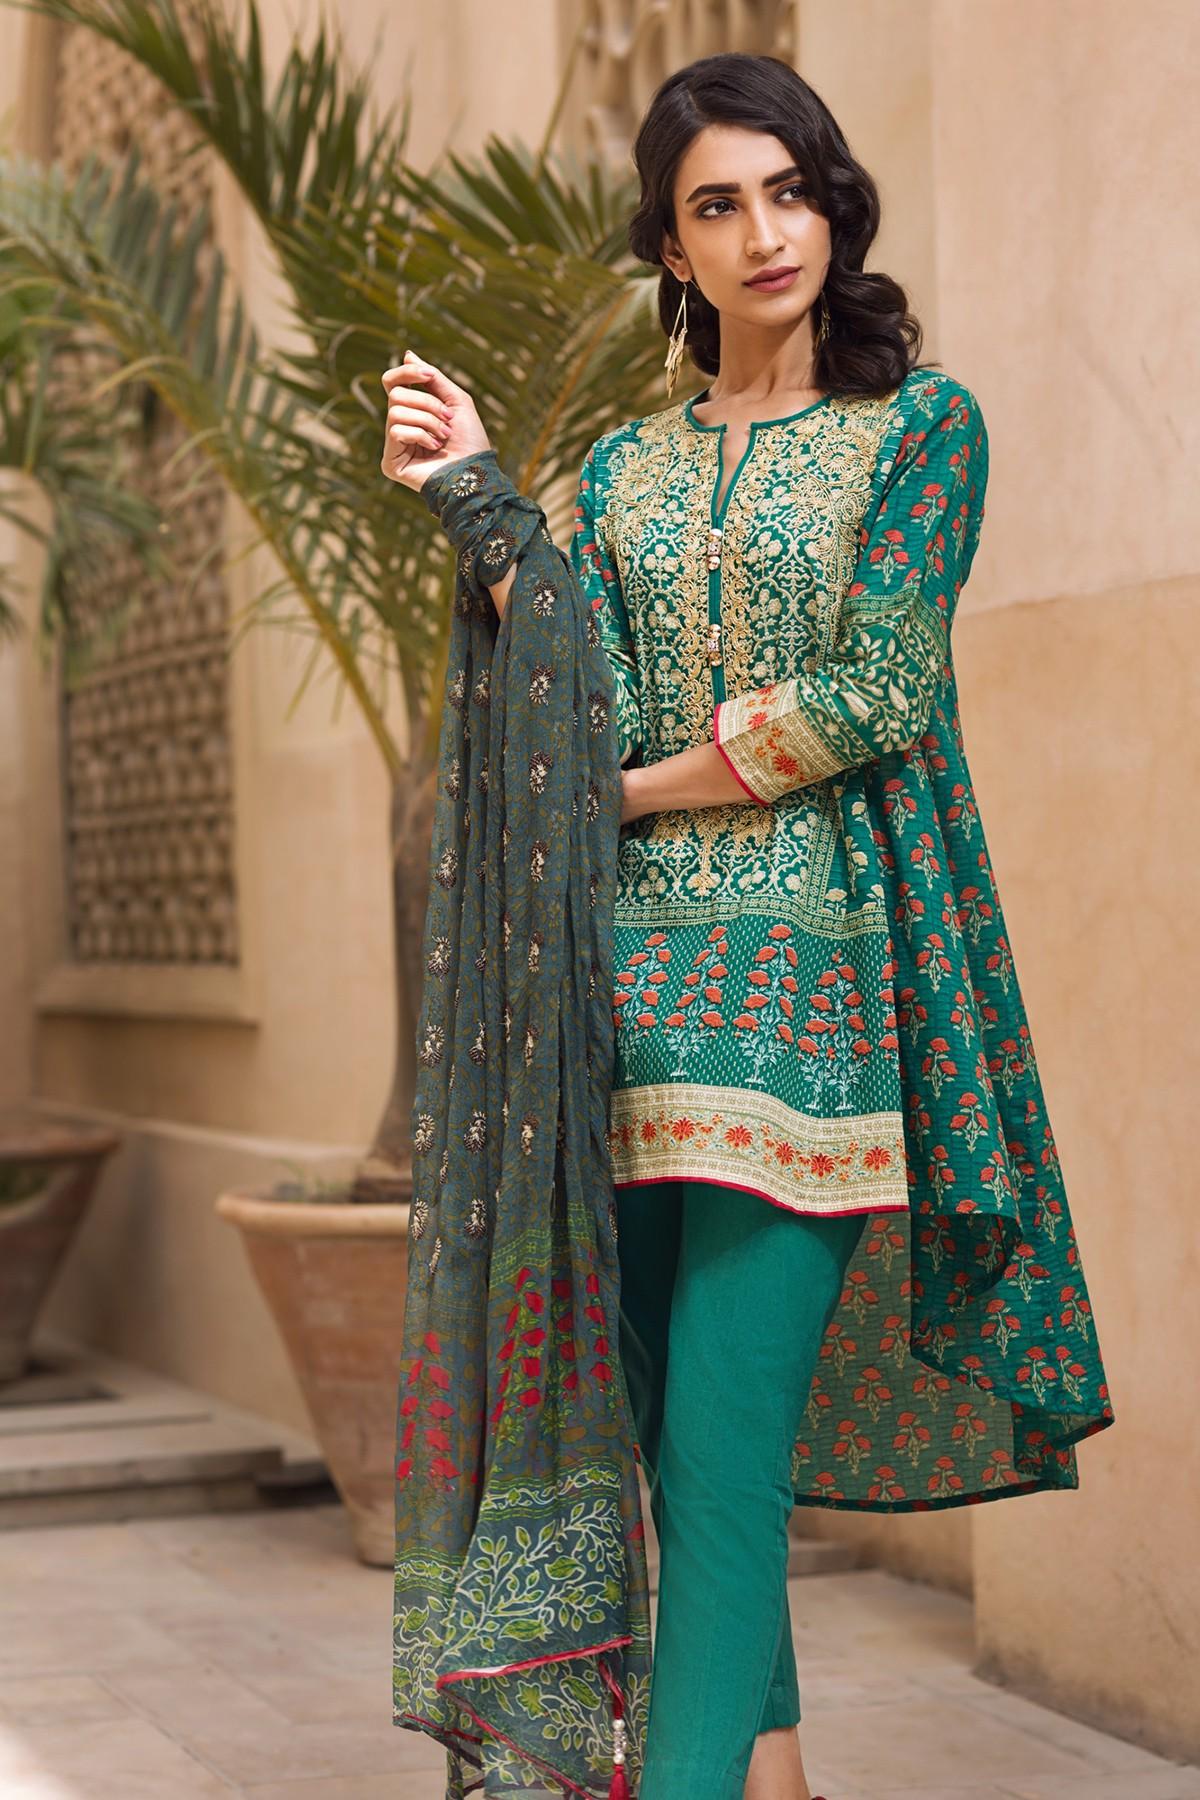 Fashion 2017 casual summer - Khaadi Lawn Chiffon Eid Dresses Designs Collection 2017 2018